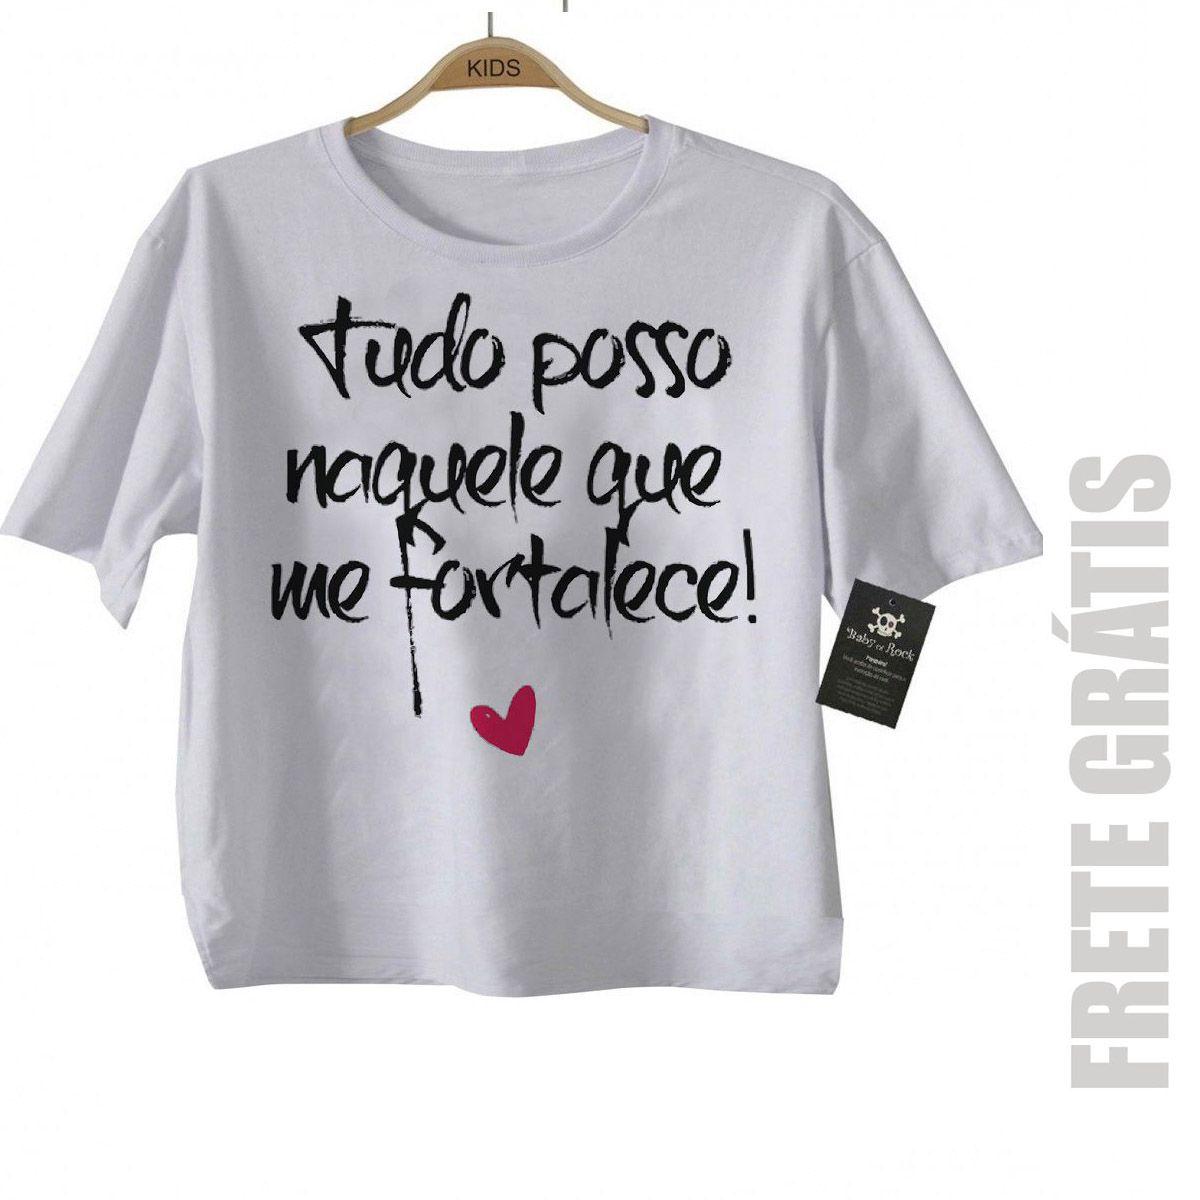 Camiseta  Gospel Tudo Posso - White  - Baby Monster S/A